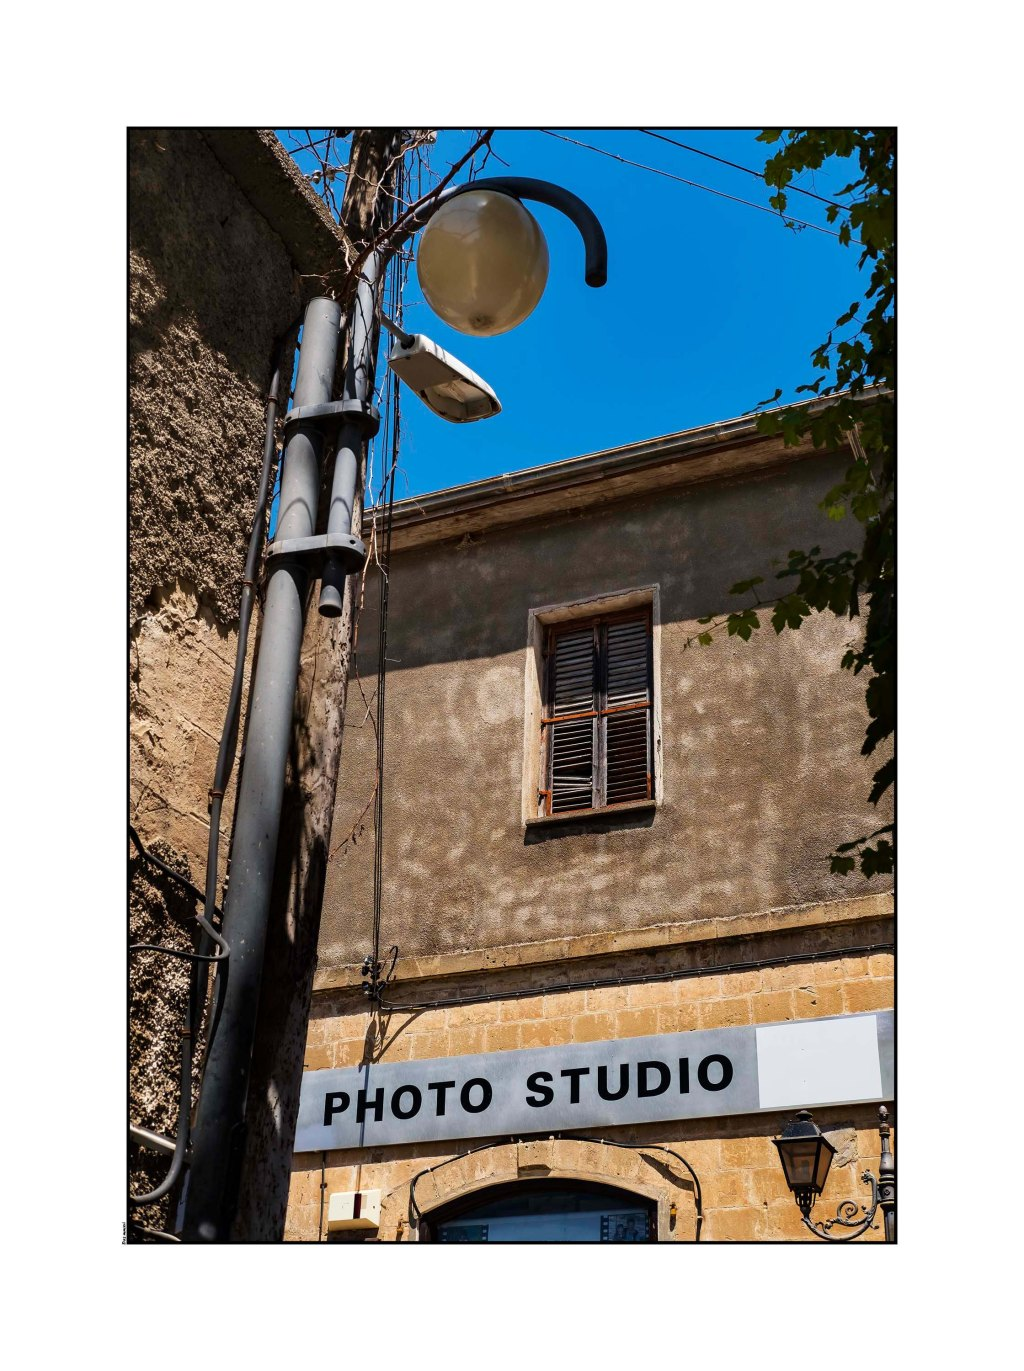 Photostudio Optomized